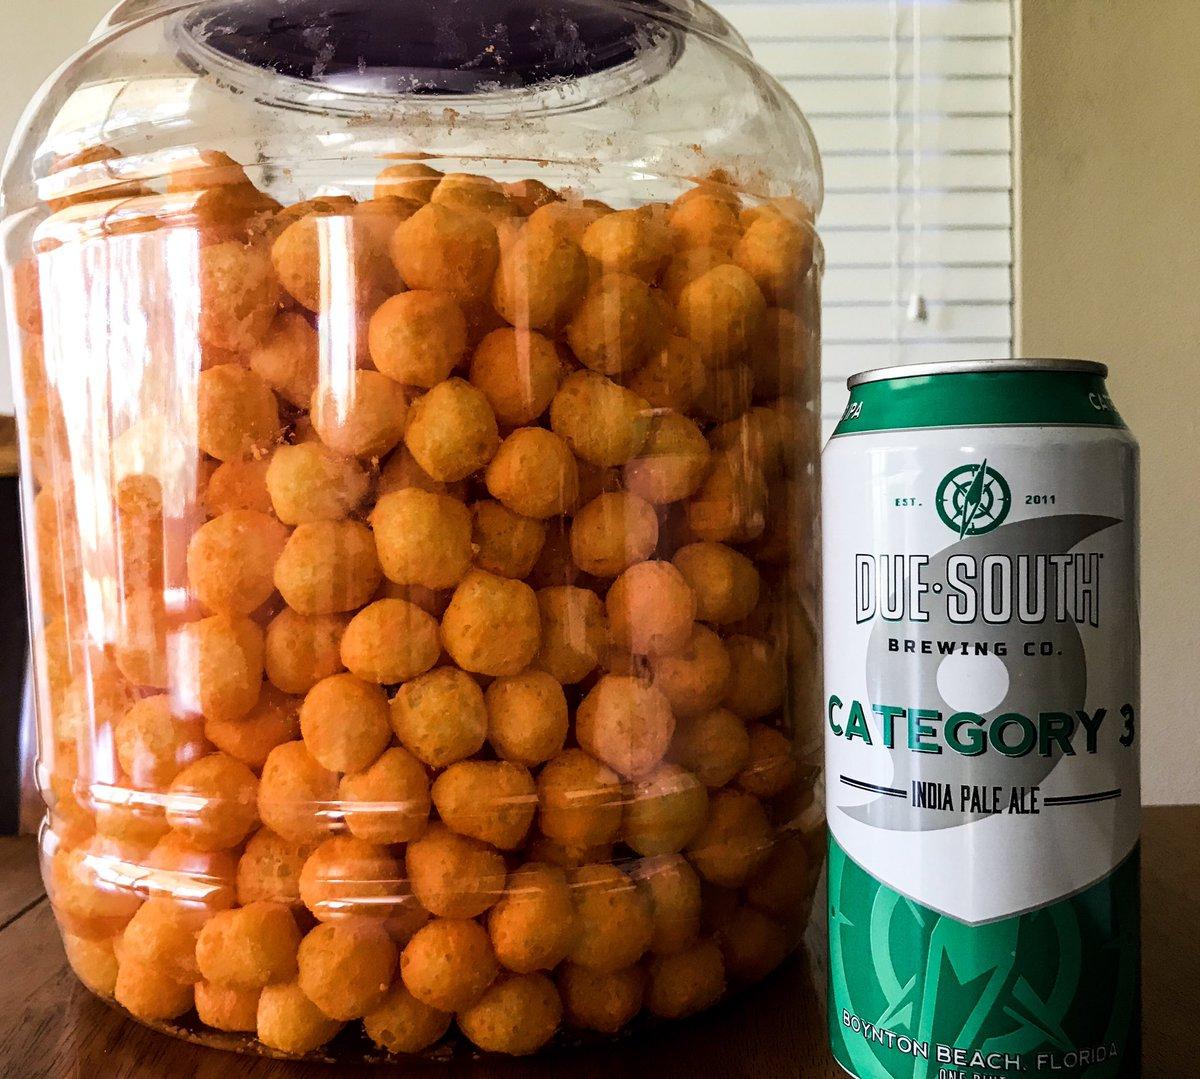 Hmmm someone broke into the hurricane snacks last night #Foodsided